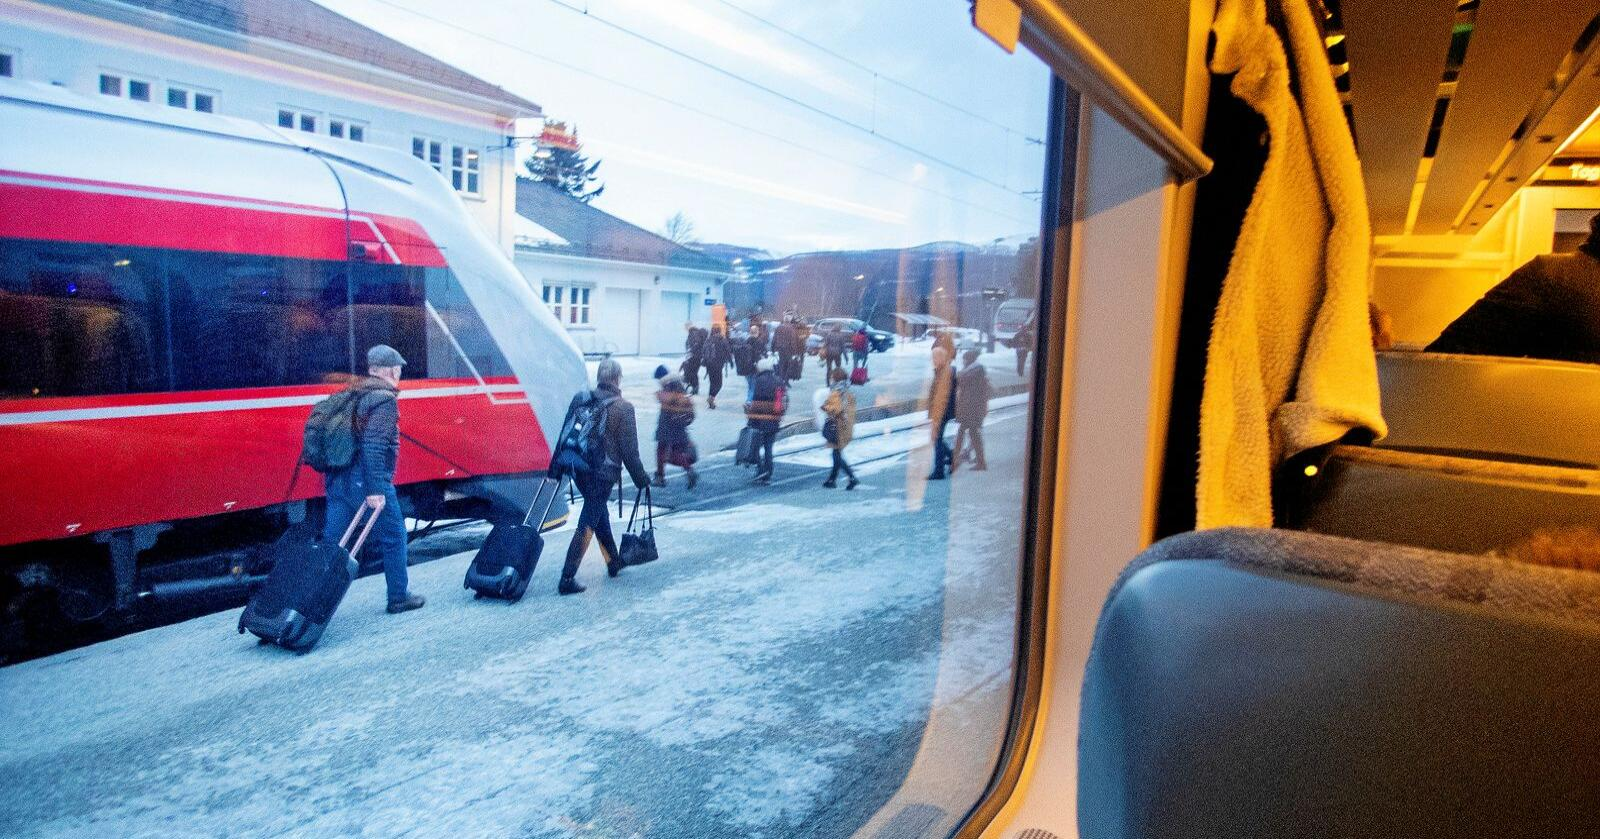 Jernbare: Regjeringen vil innføre EUs fjerde jernbanepakke i norsk rett. Foto: Gorm Kallestad / NTB scanpix